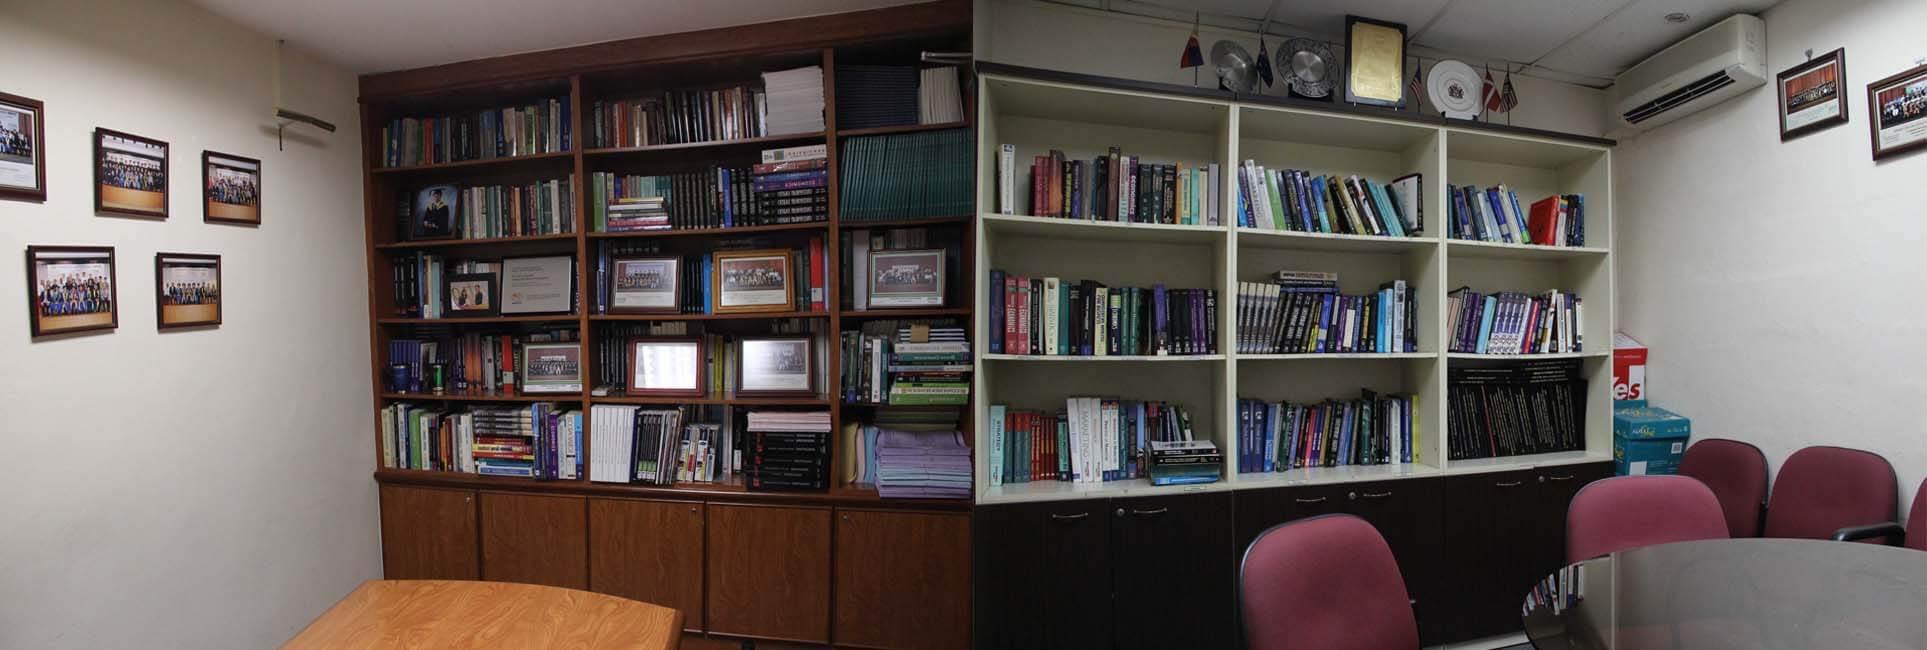 SIPMM Library